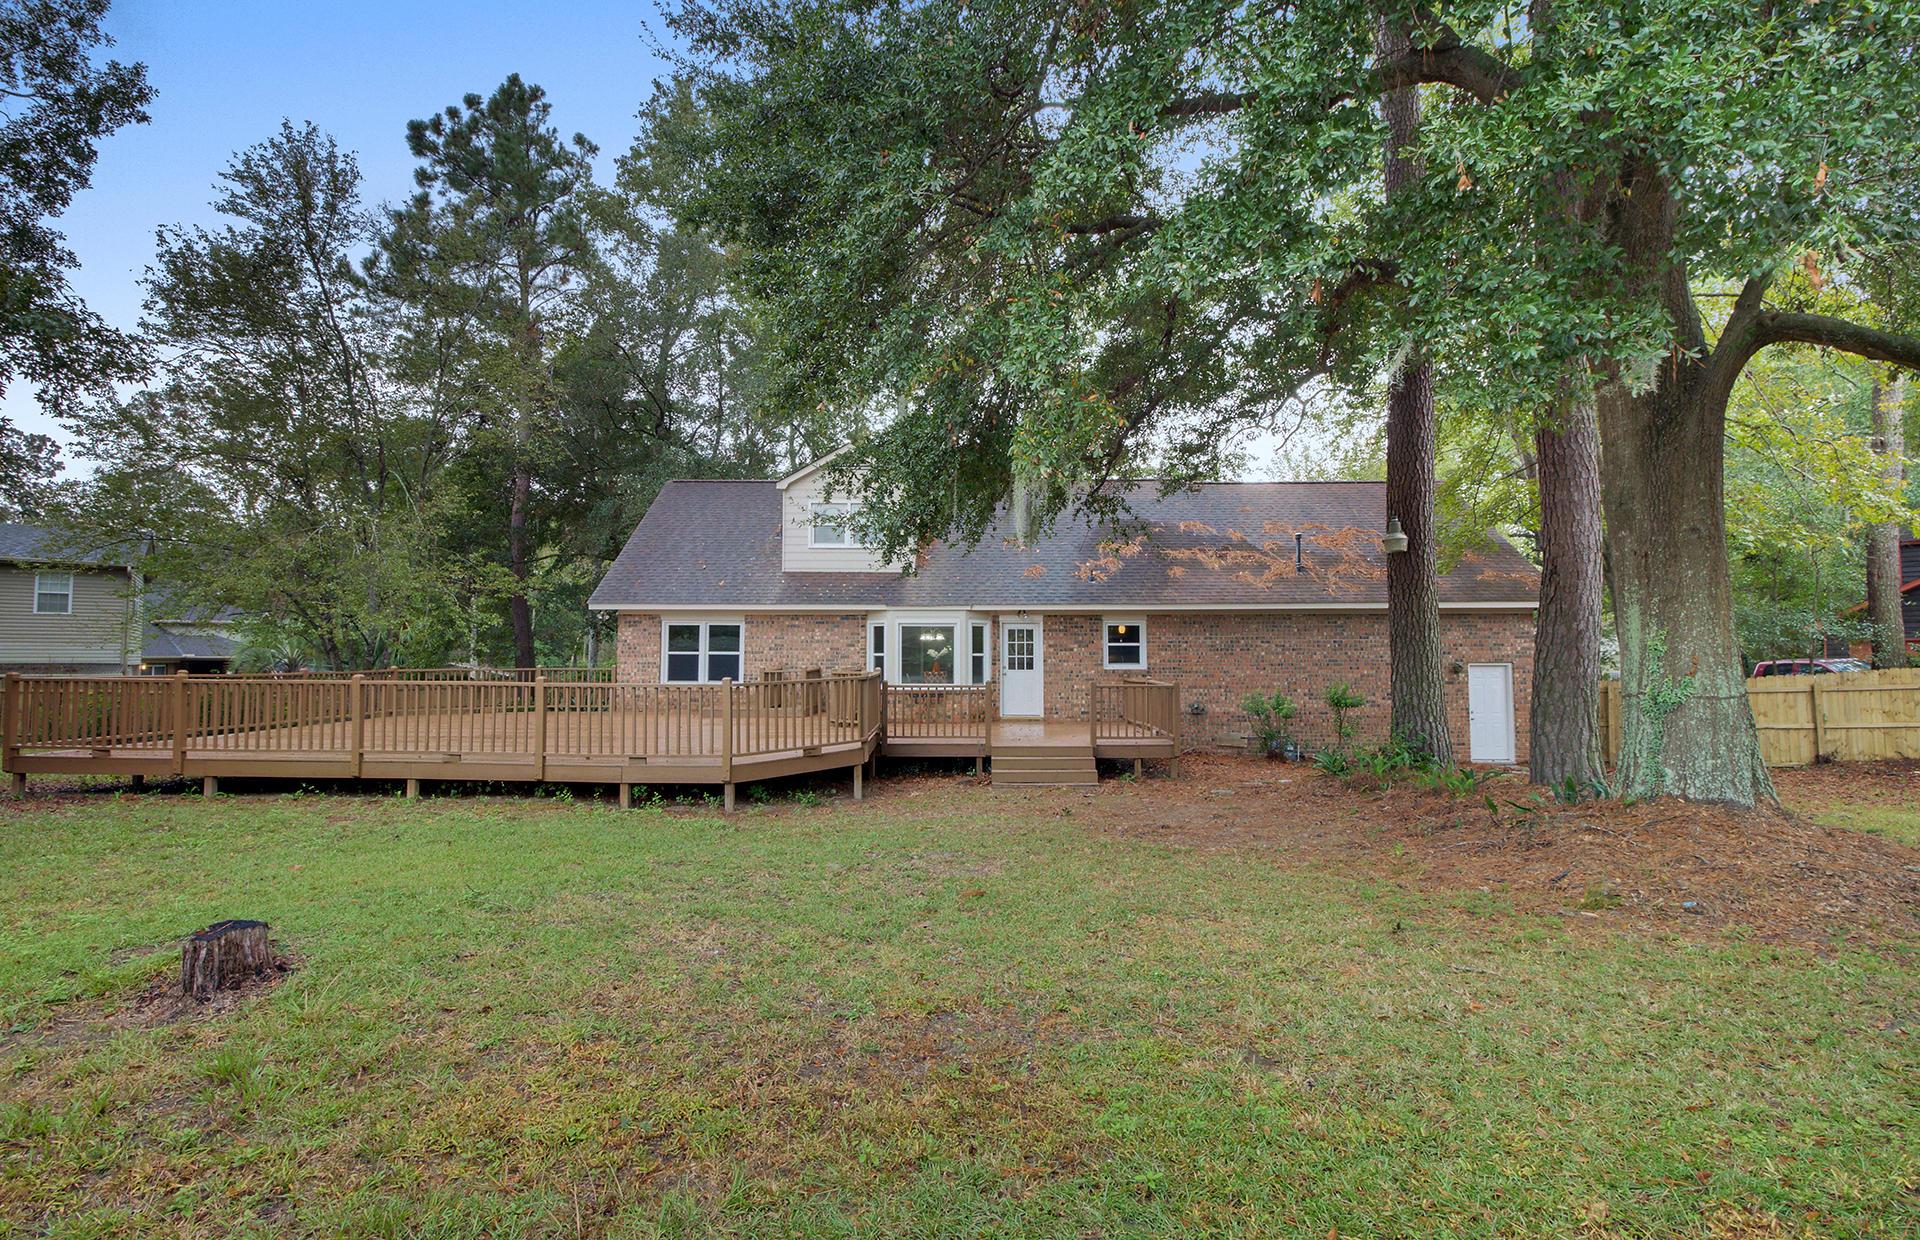 White Church Place Homes For Sale - 208 Glebe, Summerville, SC - 17